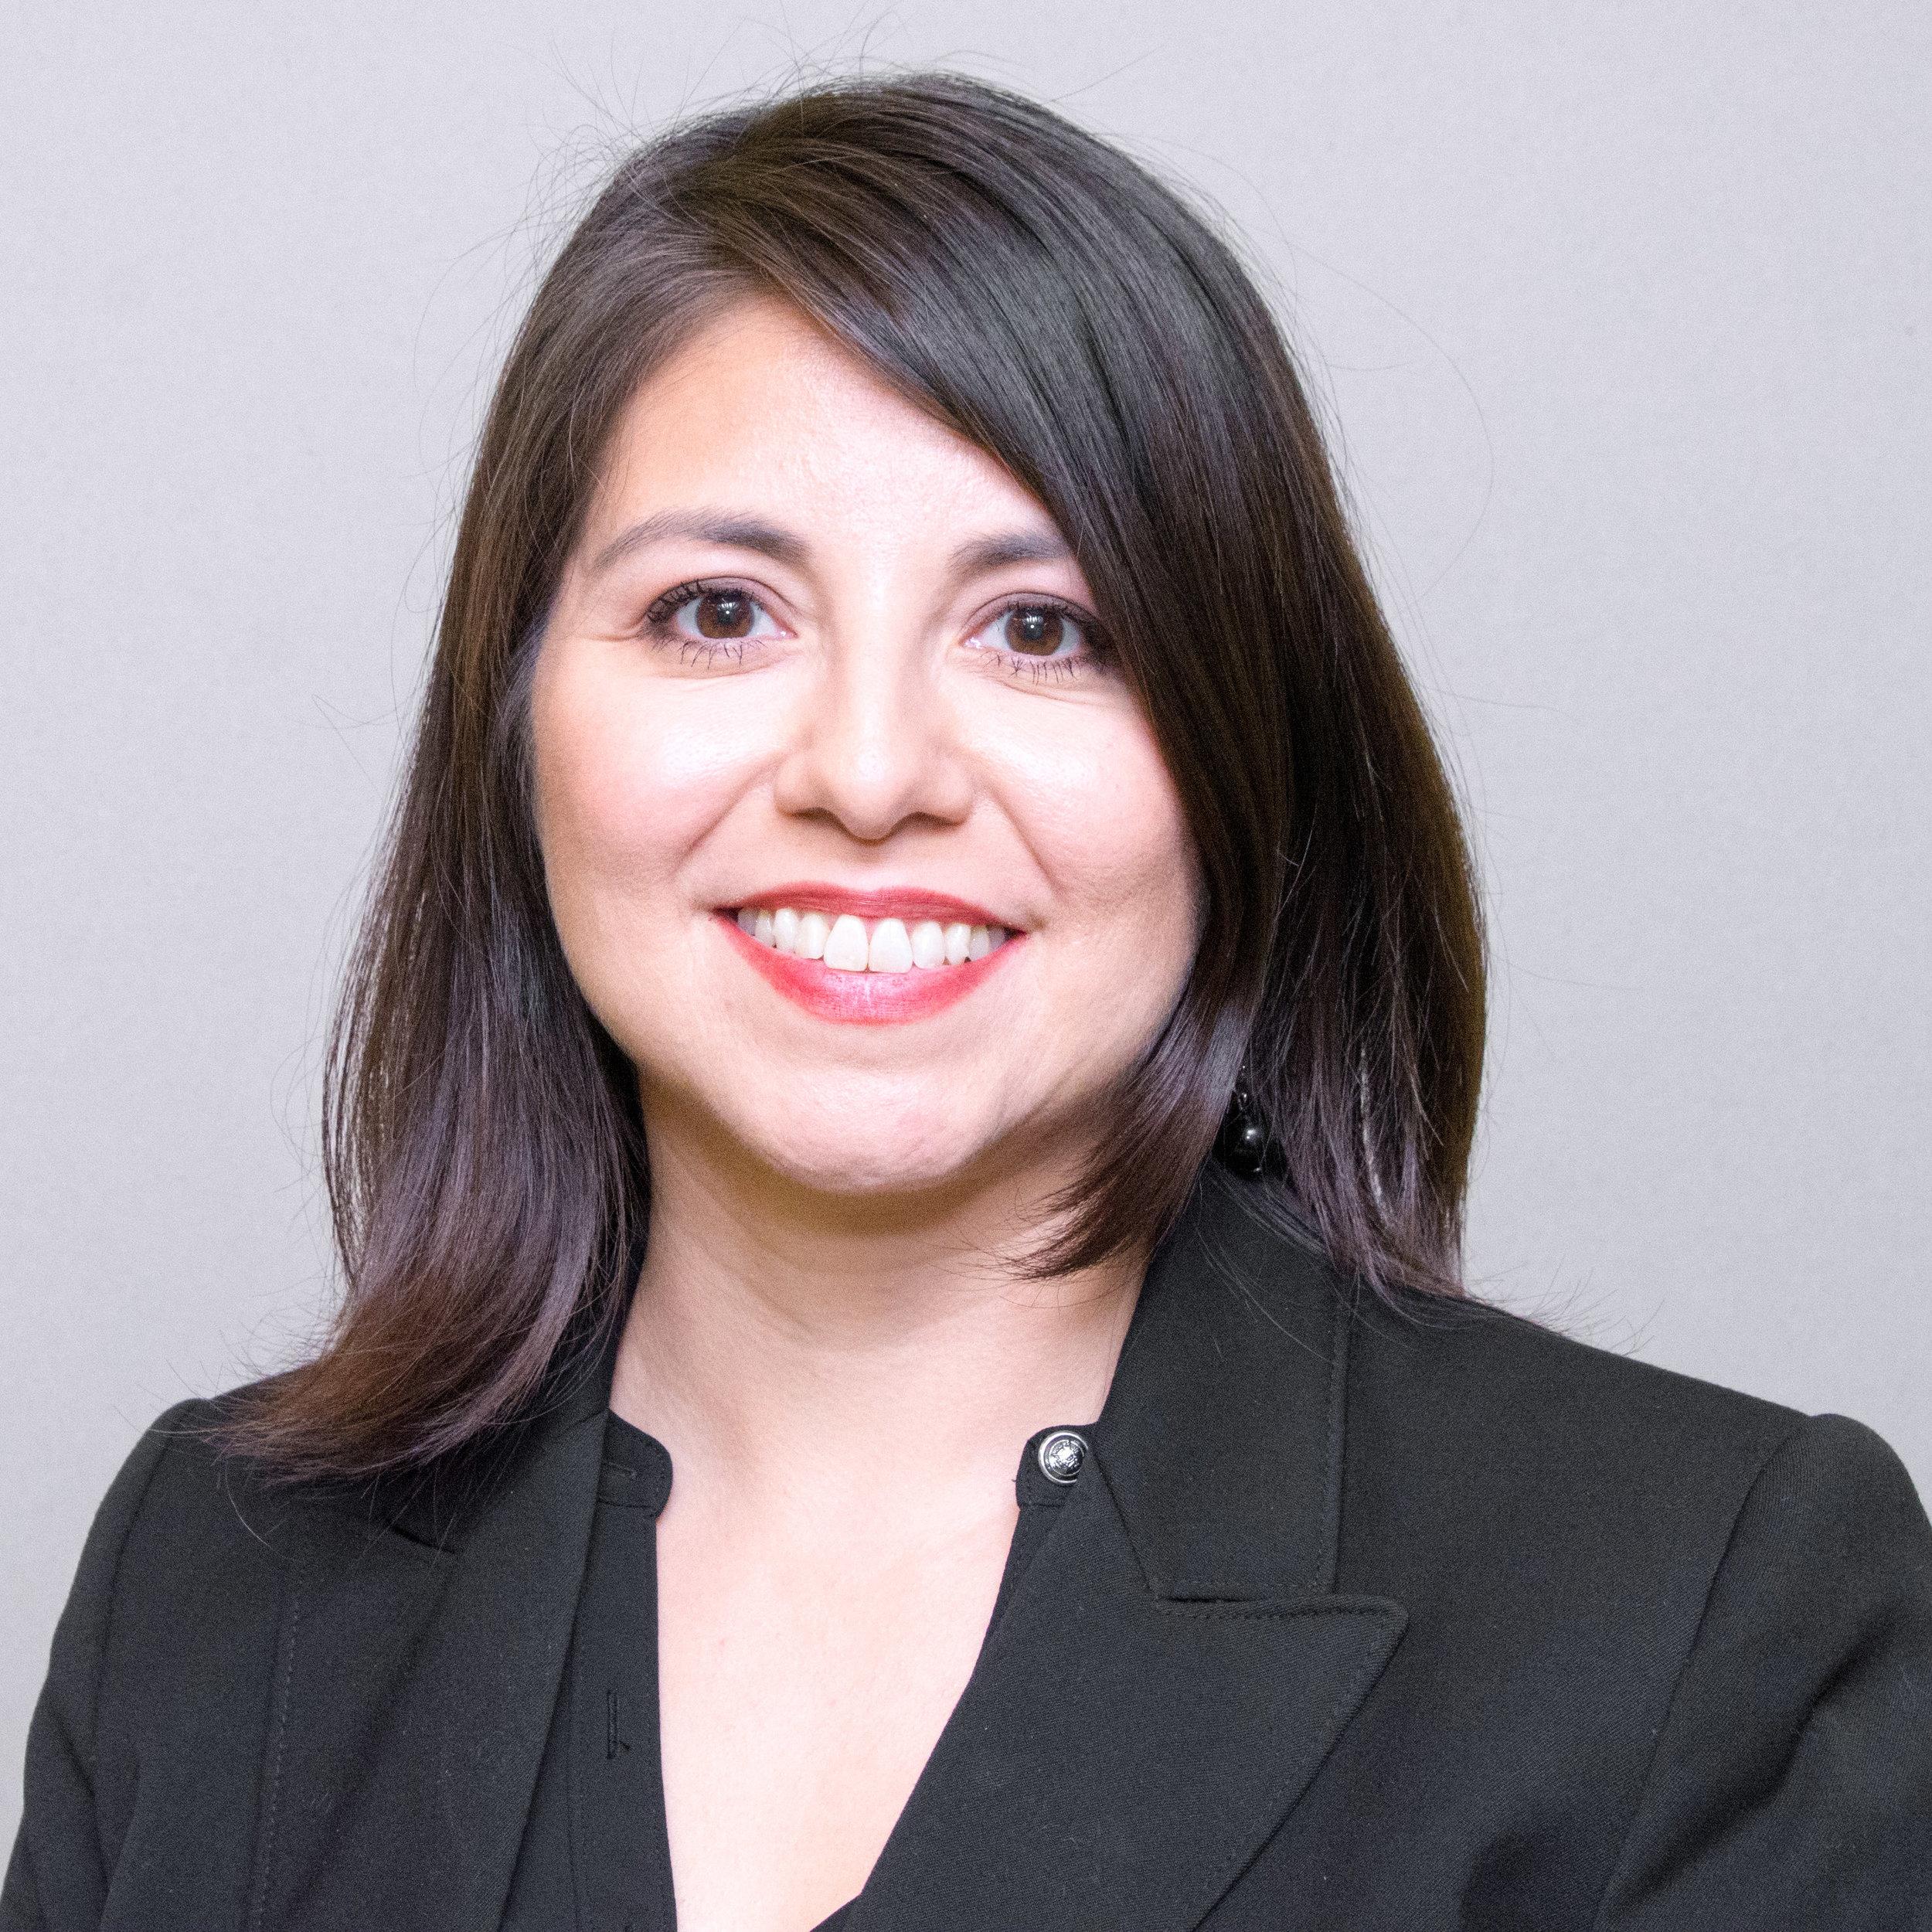 Amy Hinojosa, Process Engineer, Chevron